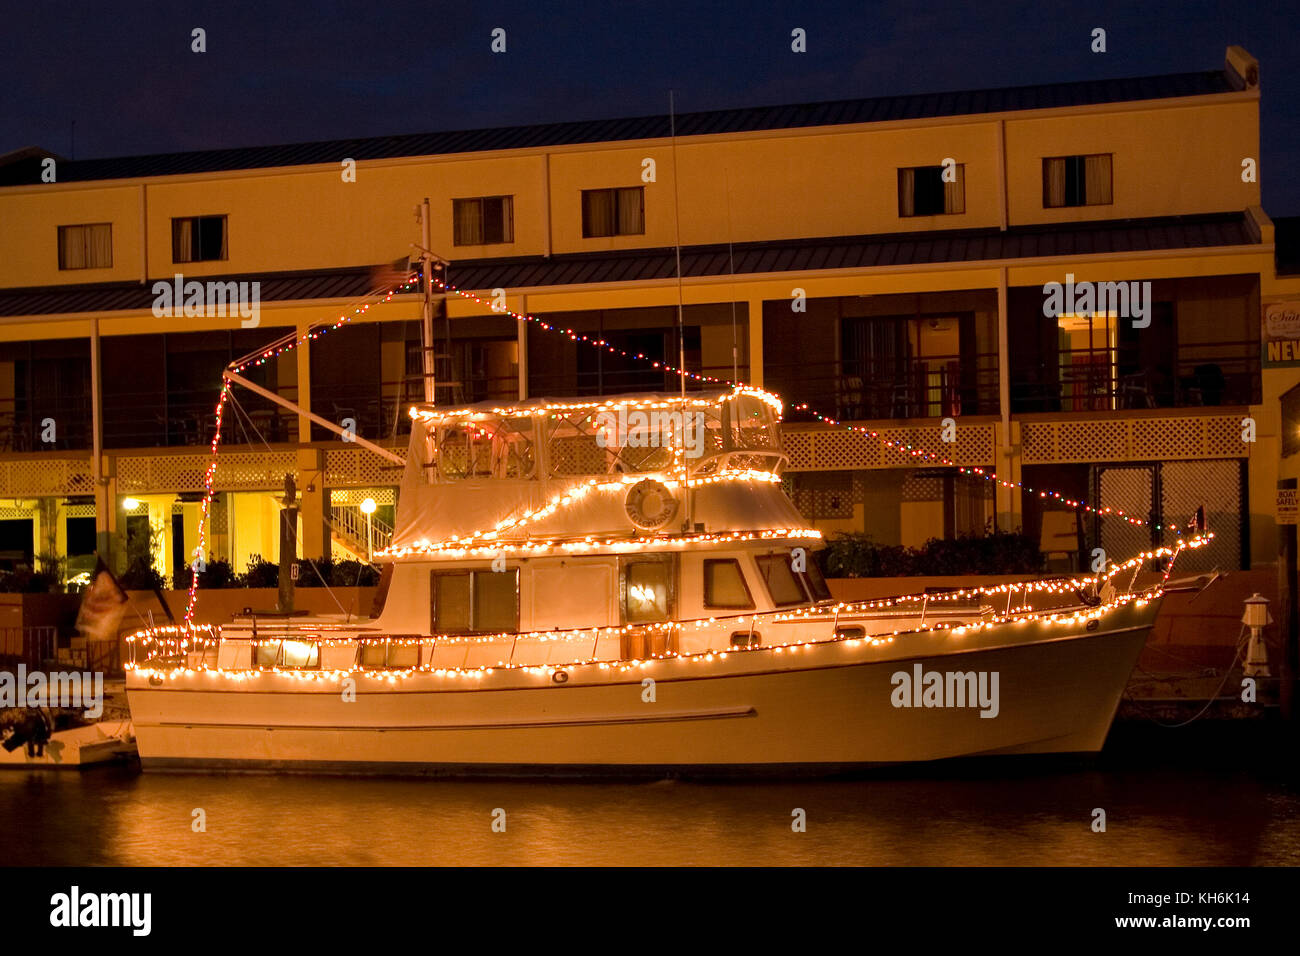 Christmas In Florida Keys.Boat Decorated In Christmas Lights Key Largo Florida Keys